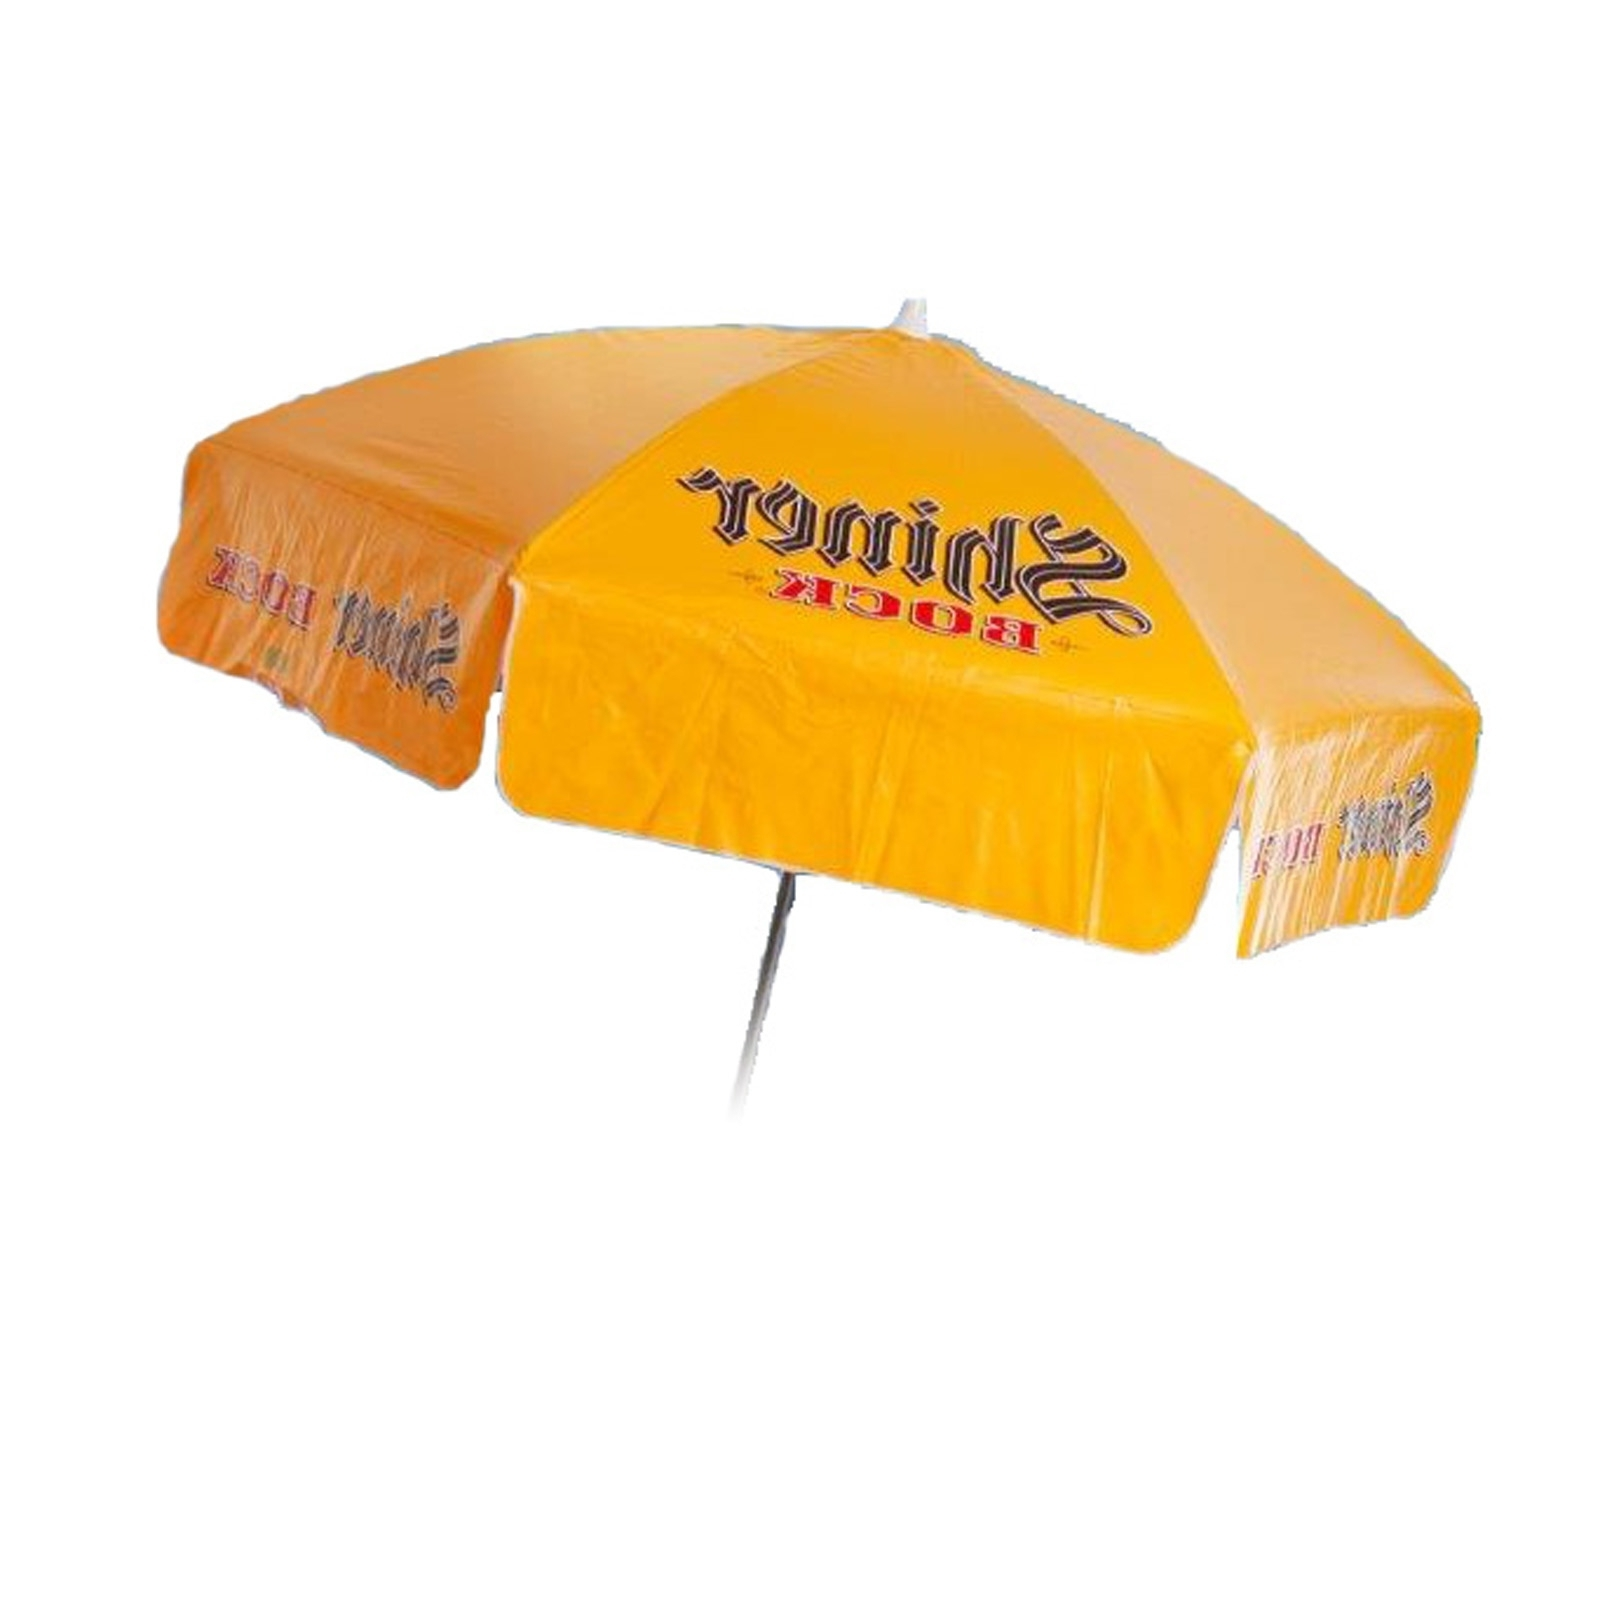 6 Foot Push Tilt Cinzano Vinyl Umbrella Patio Pole – Lawsonreport Within Trendy Vinyl Patio Umbrellas (View 4 of 20)